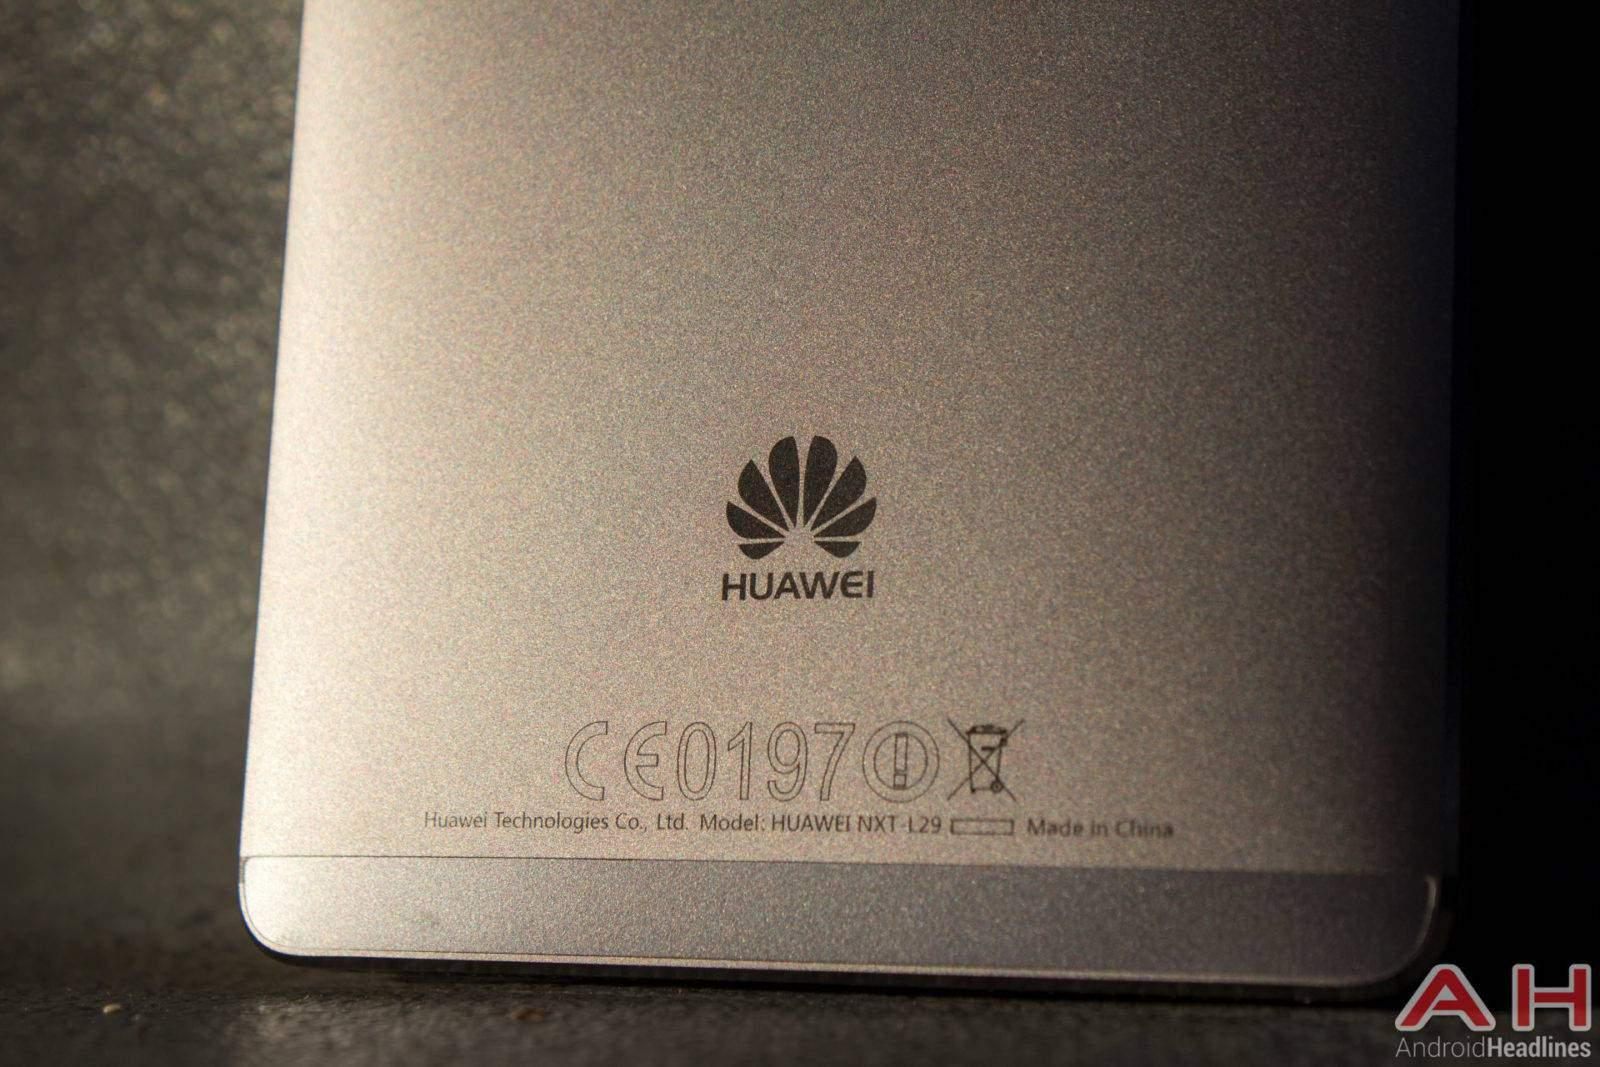 Huawei-Mate-8-AH-NS-logo-2